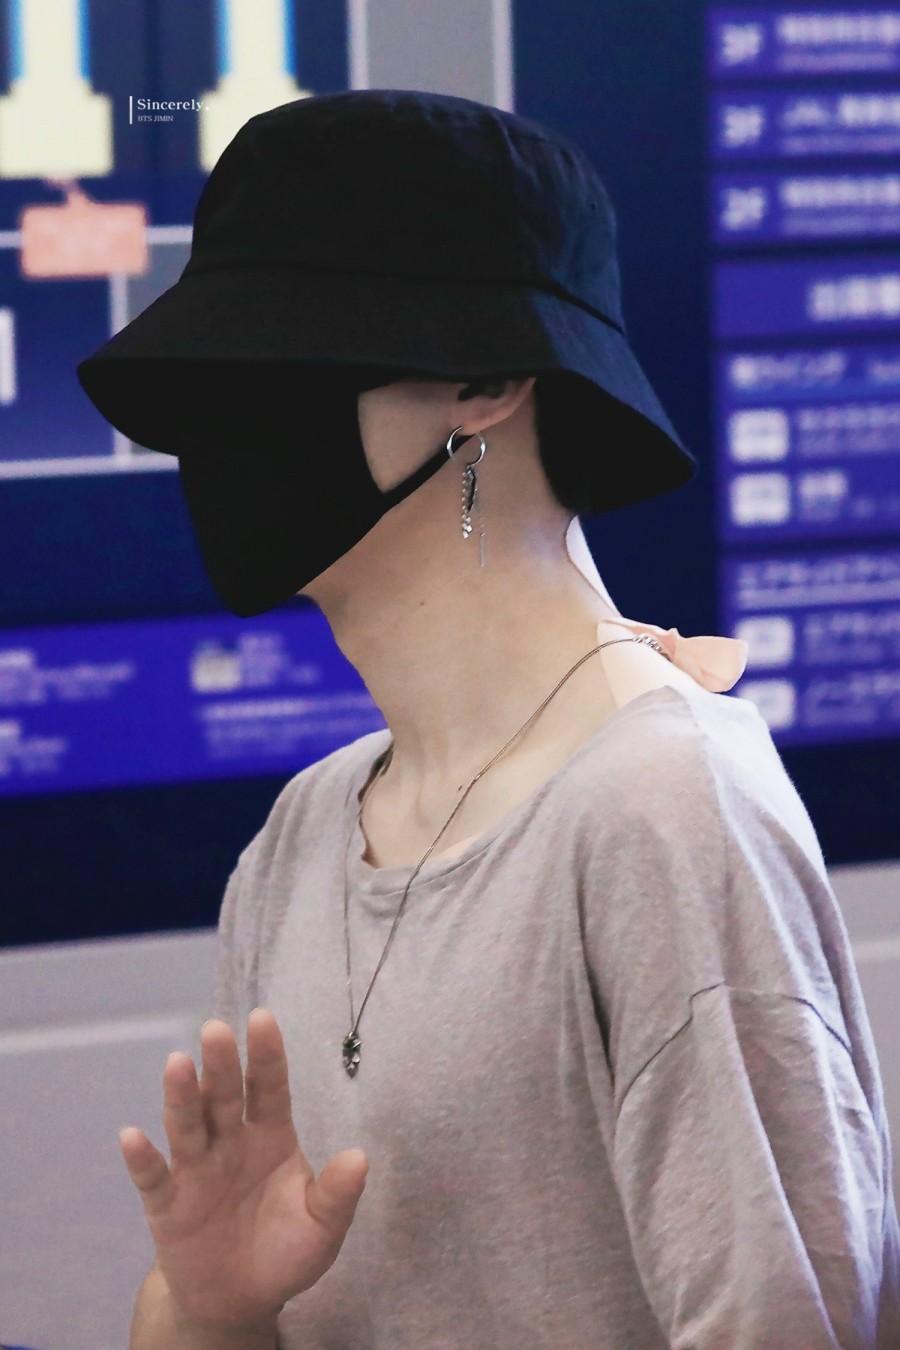 jimin neck bandage 6